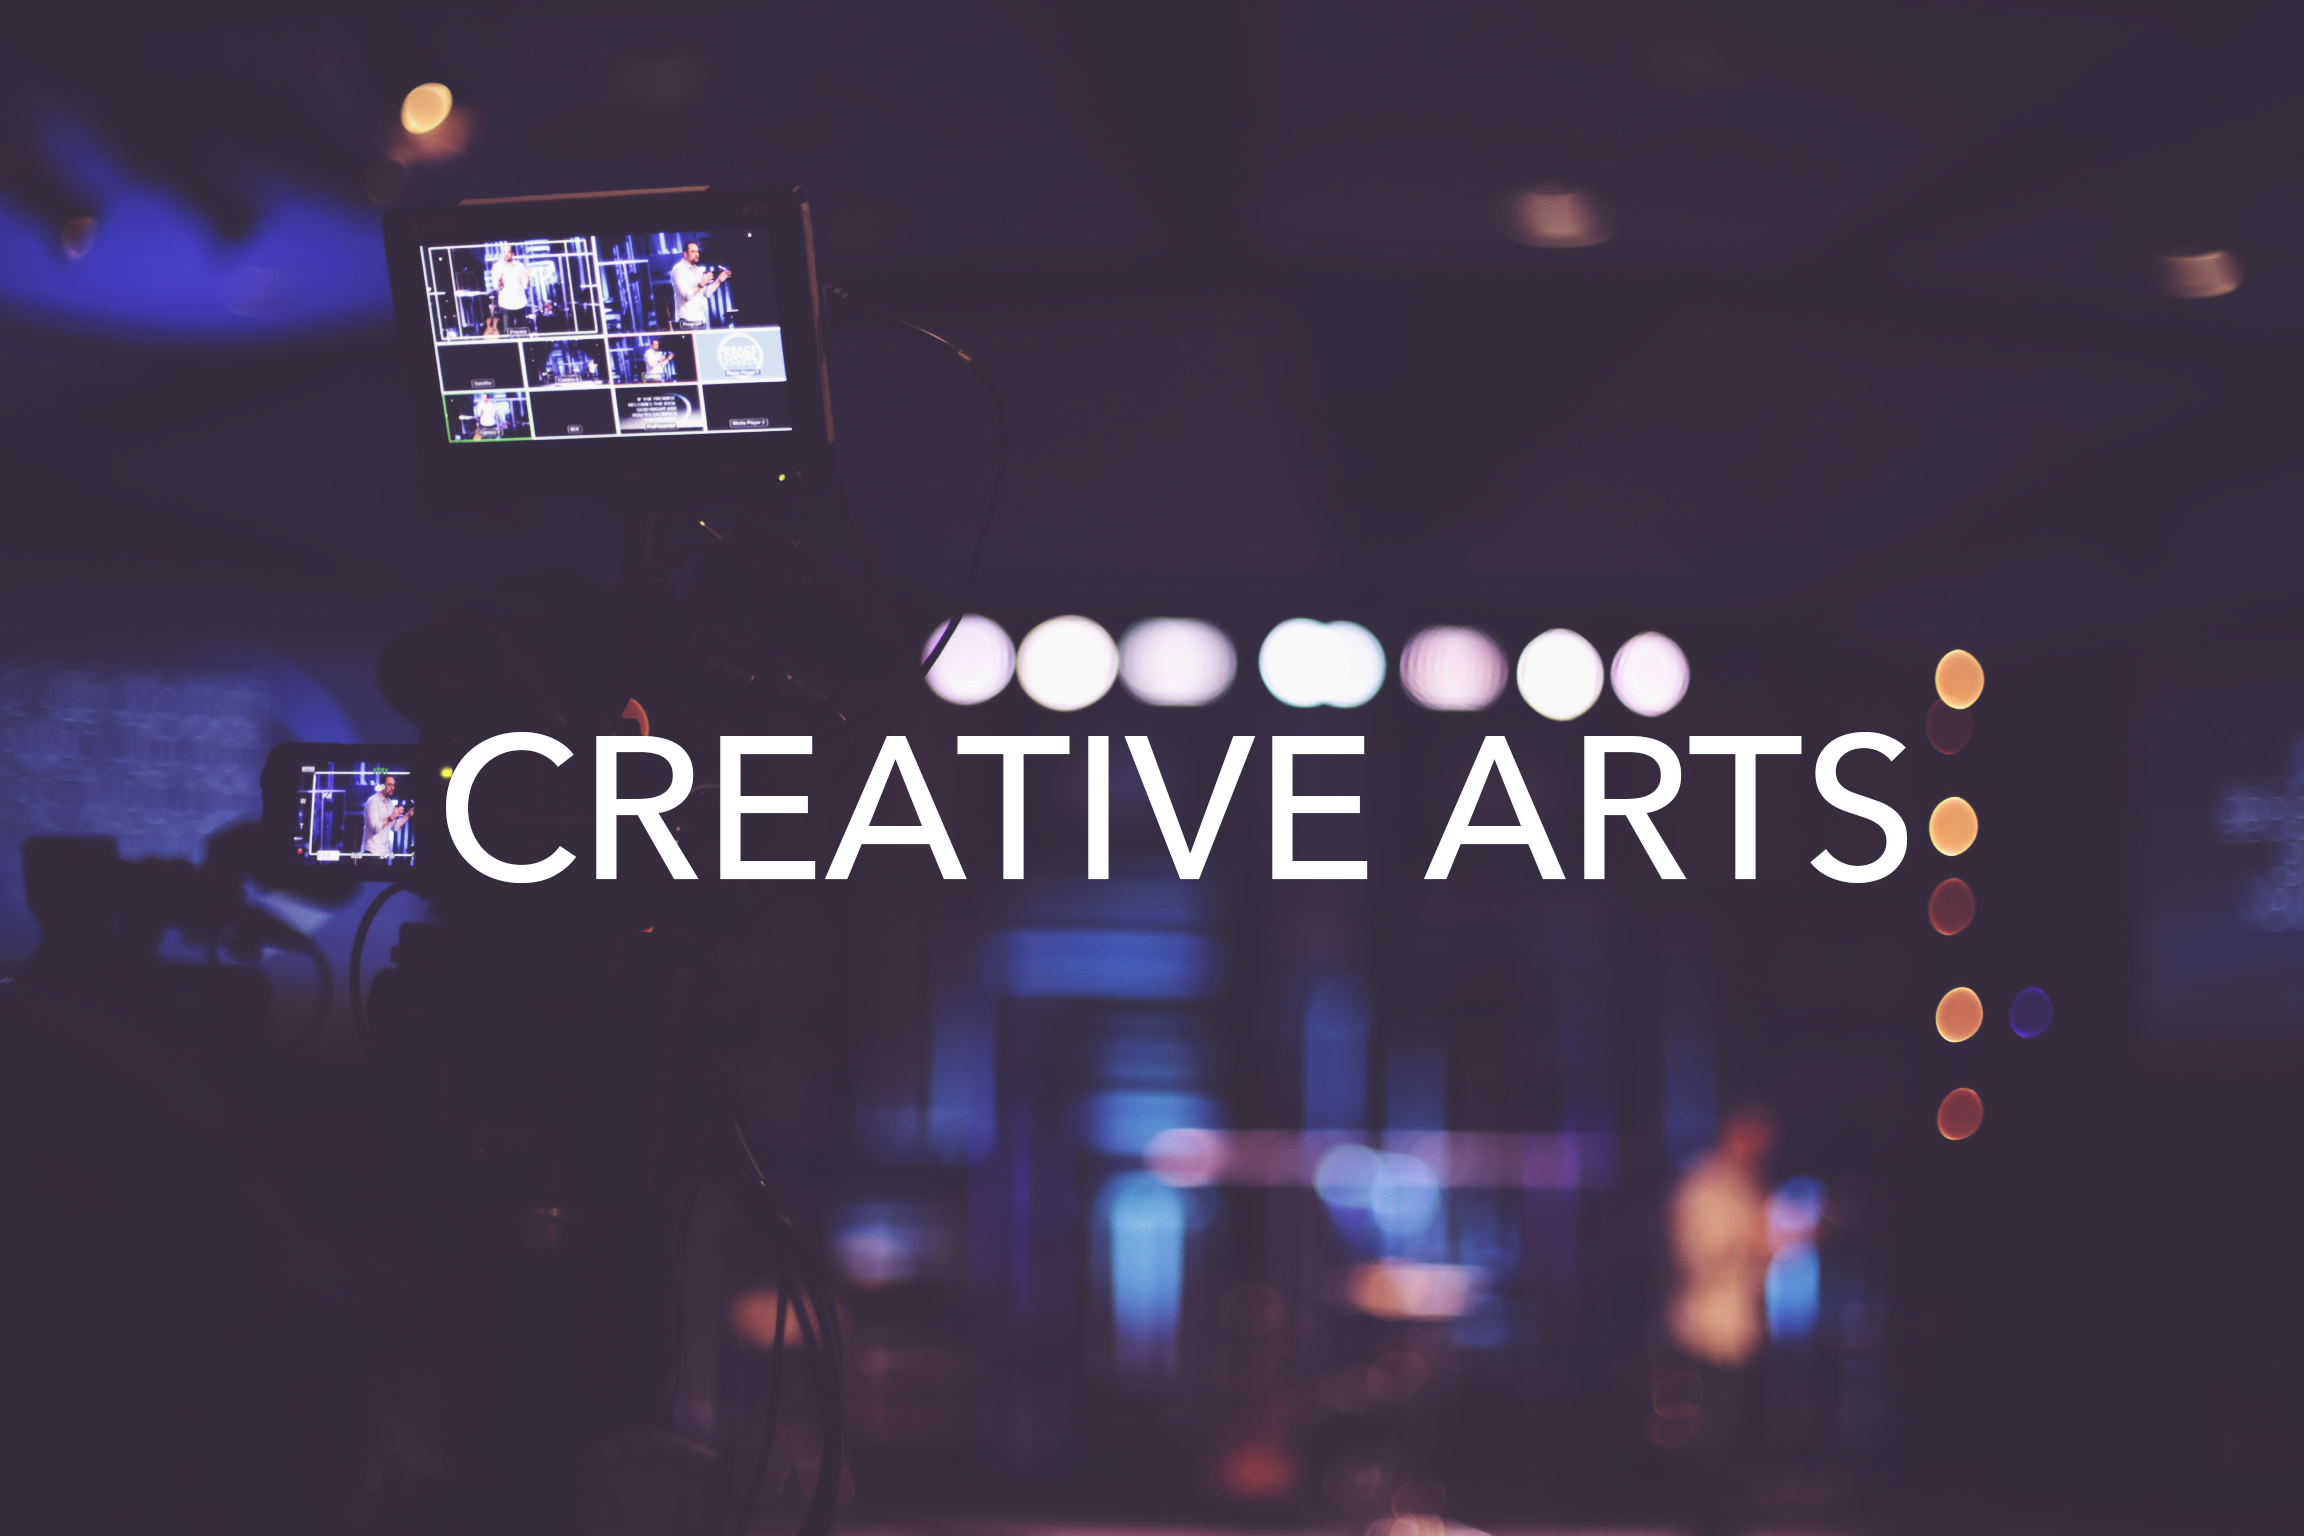 Worship, Sound, Lighting, Video, Set Design, Painting, Graphics, Decor